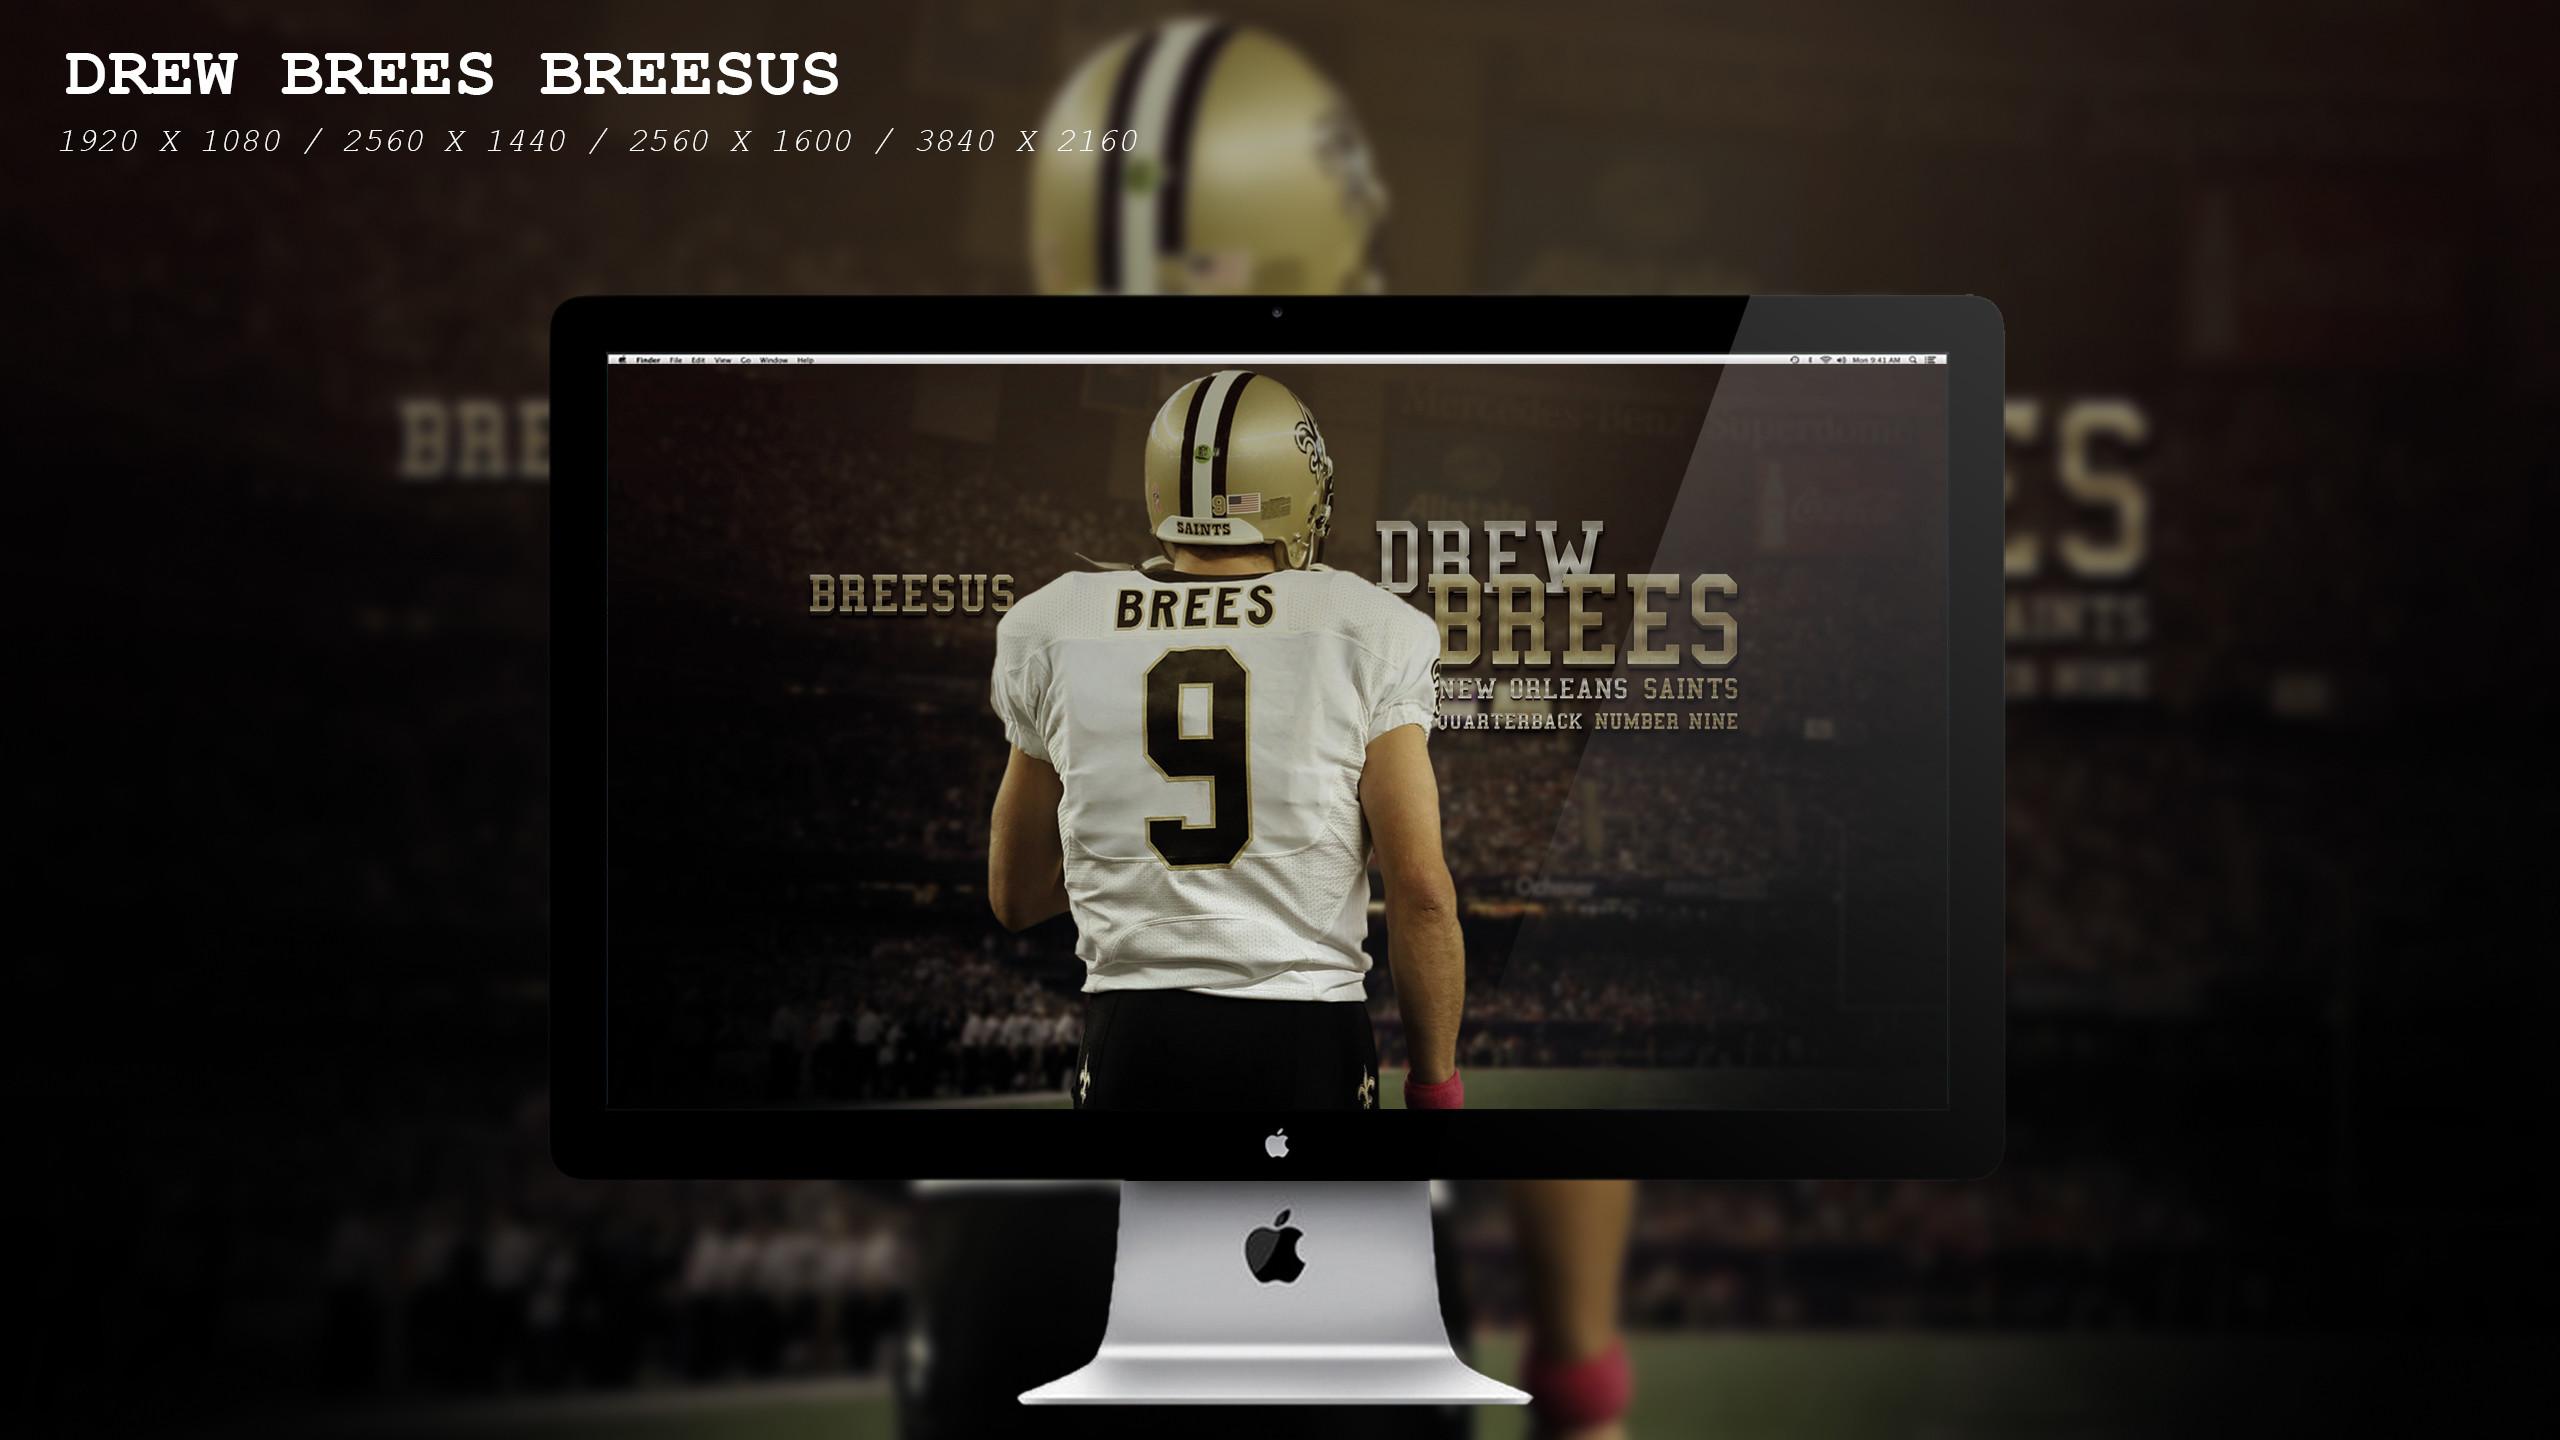 … Drew Brees Breesus Wallpaper HD by BeAware8